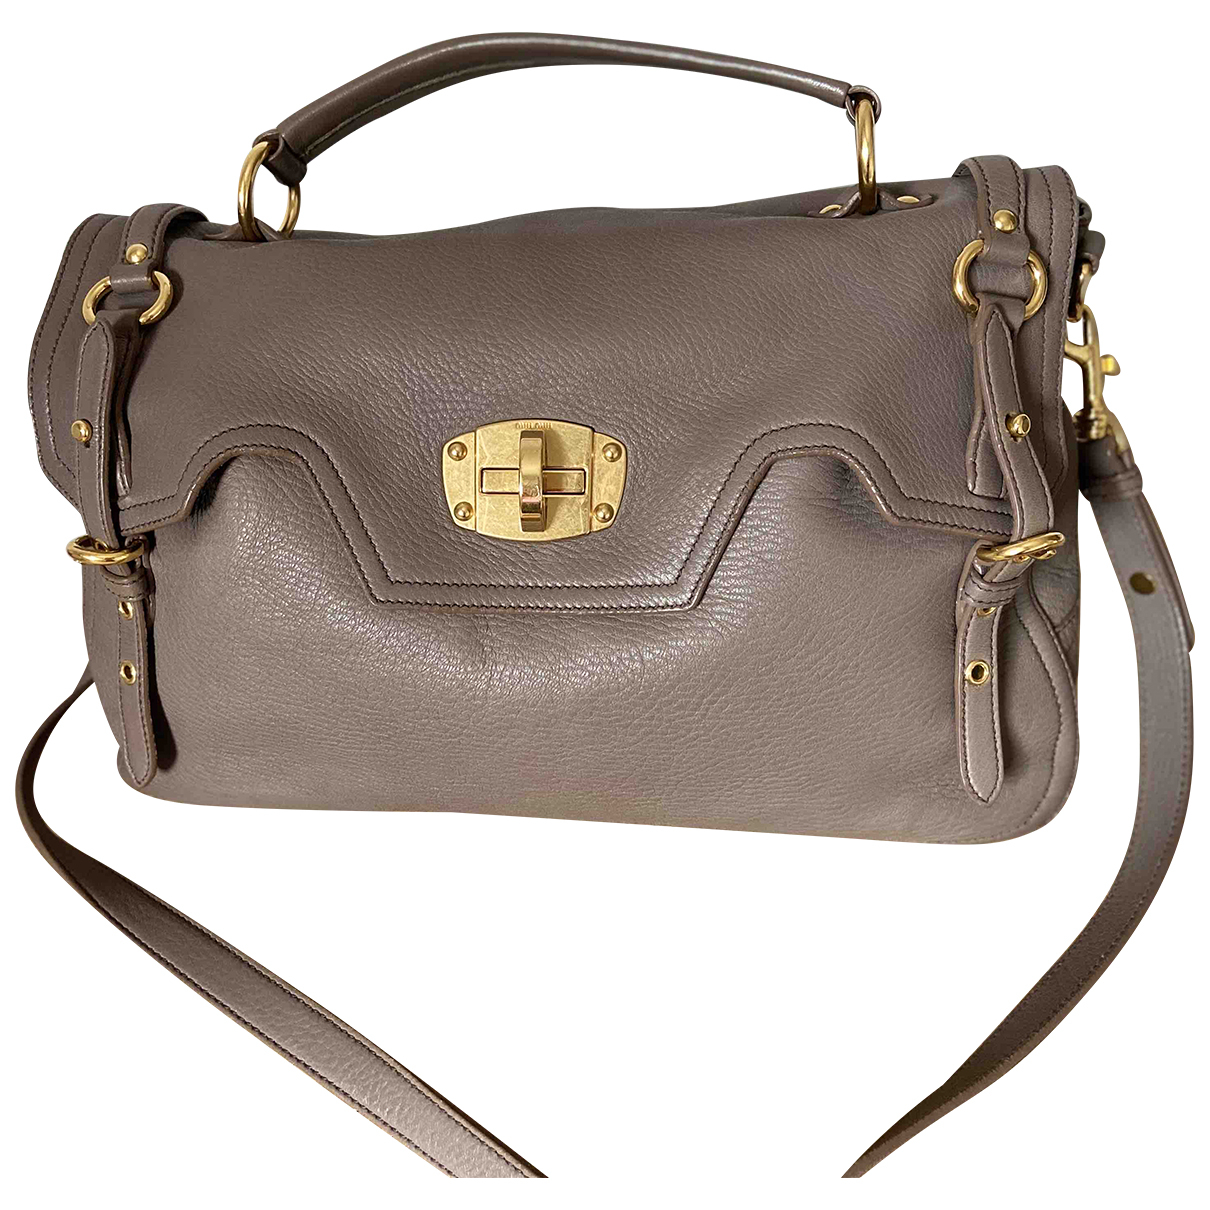 Miu Miu N Grey Leather handbag for Women N